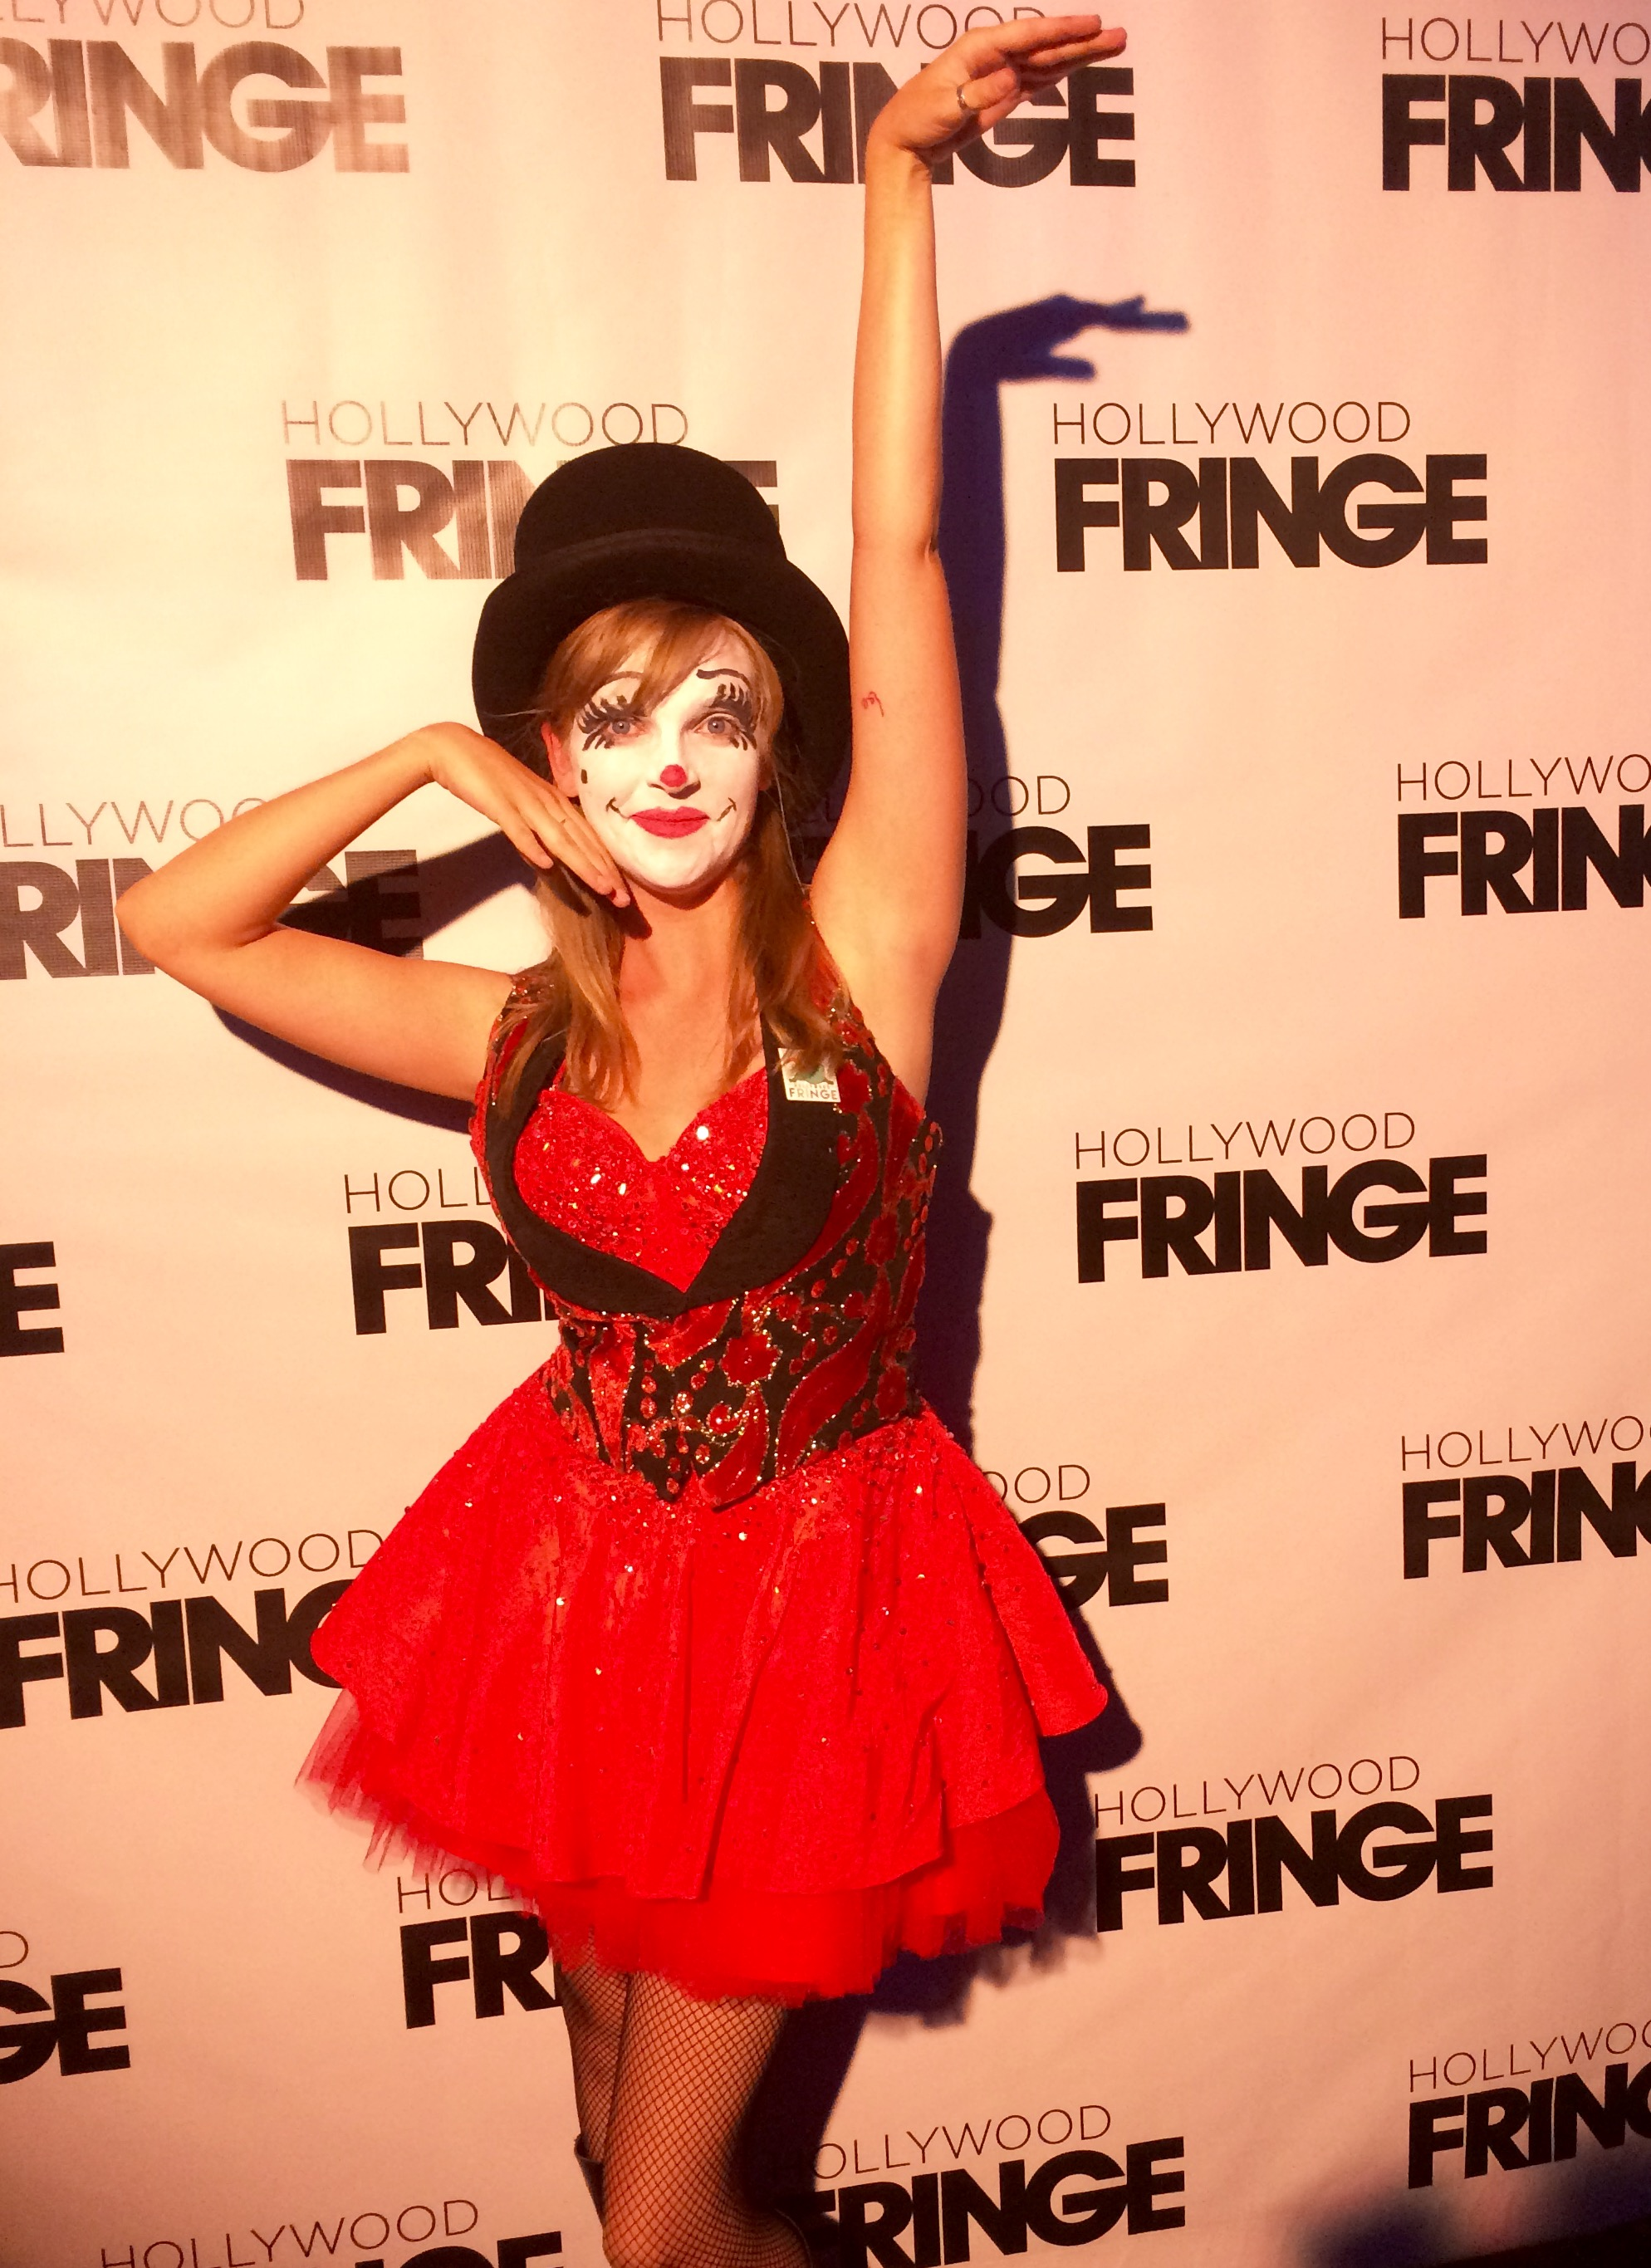 Rosa at Hollywood Fringe